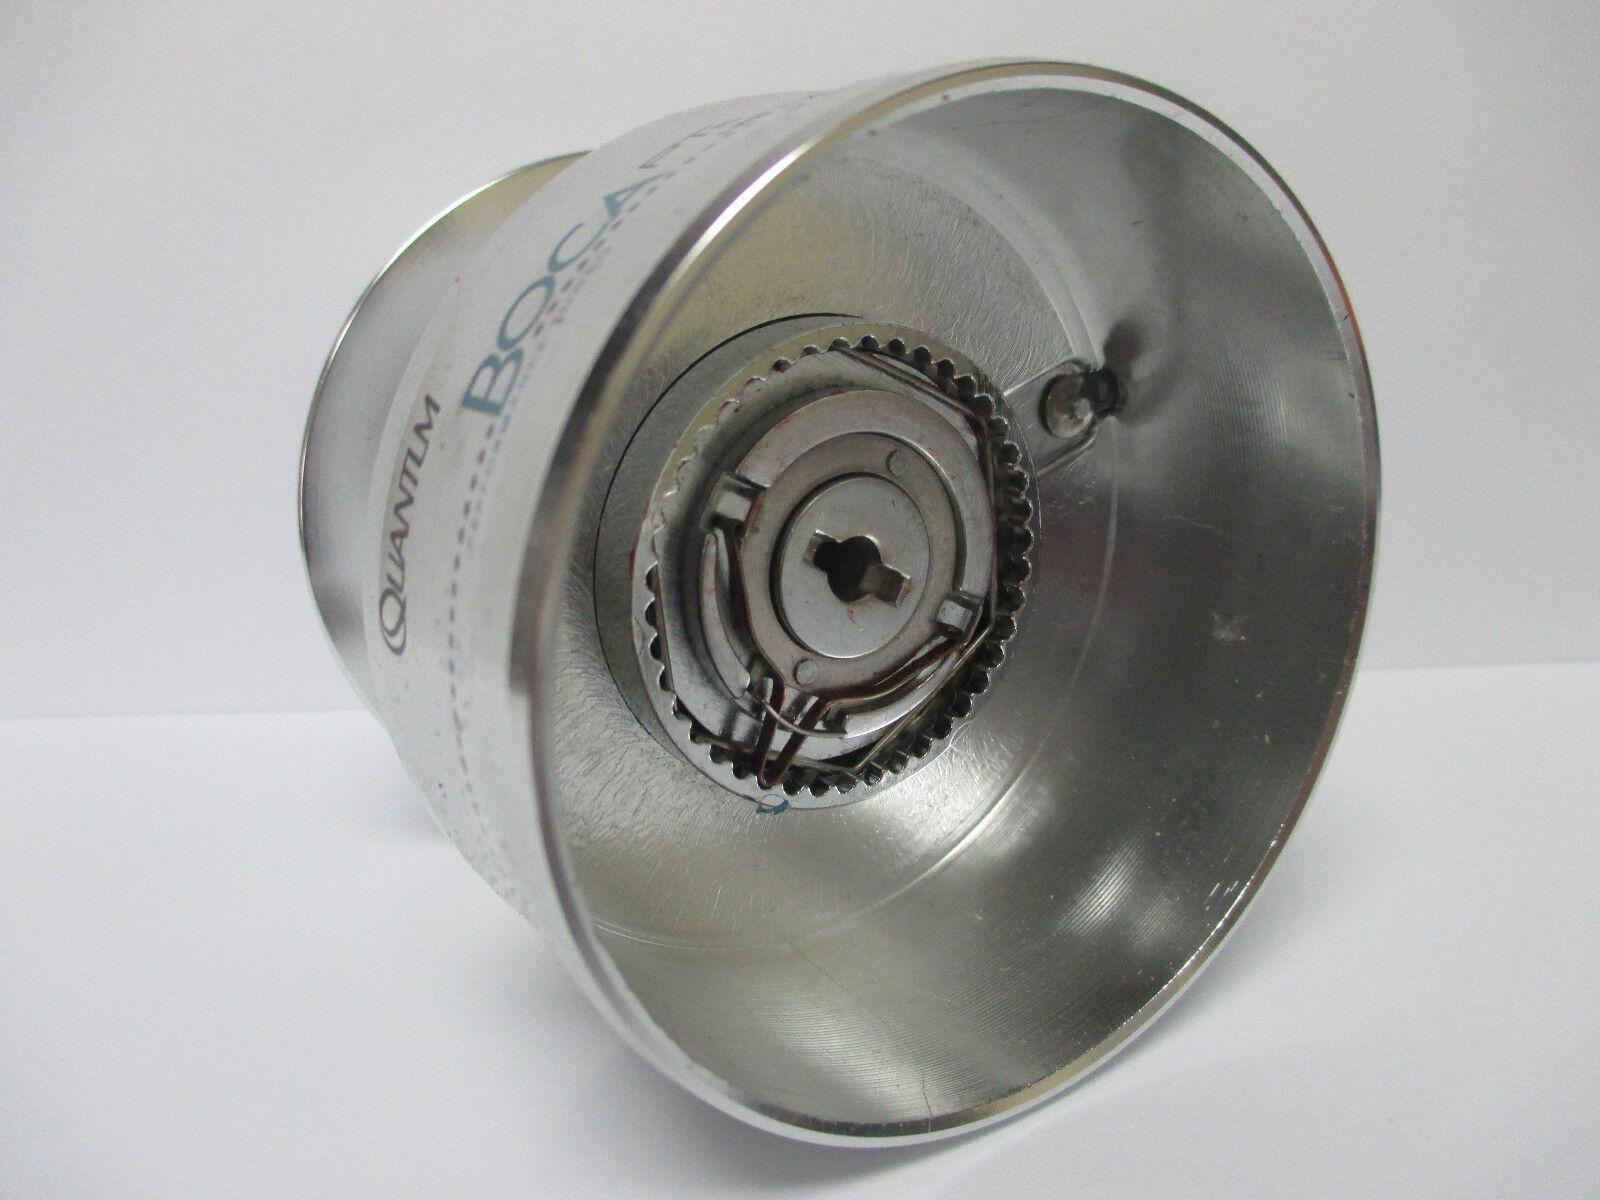 NEW NEW NEW QUANTUM SPINNING REEL PART - ET4321-01 Boca 80 BSP80PTS - Spool Assembly c87f61